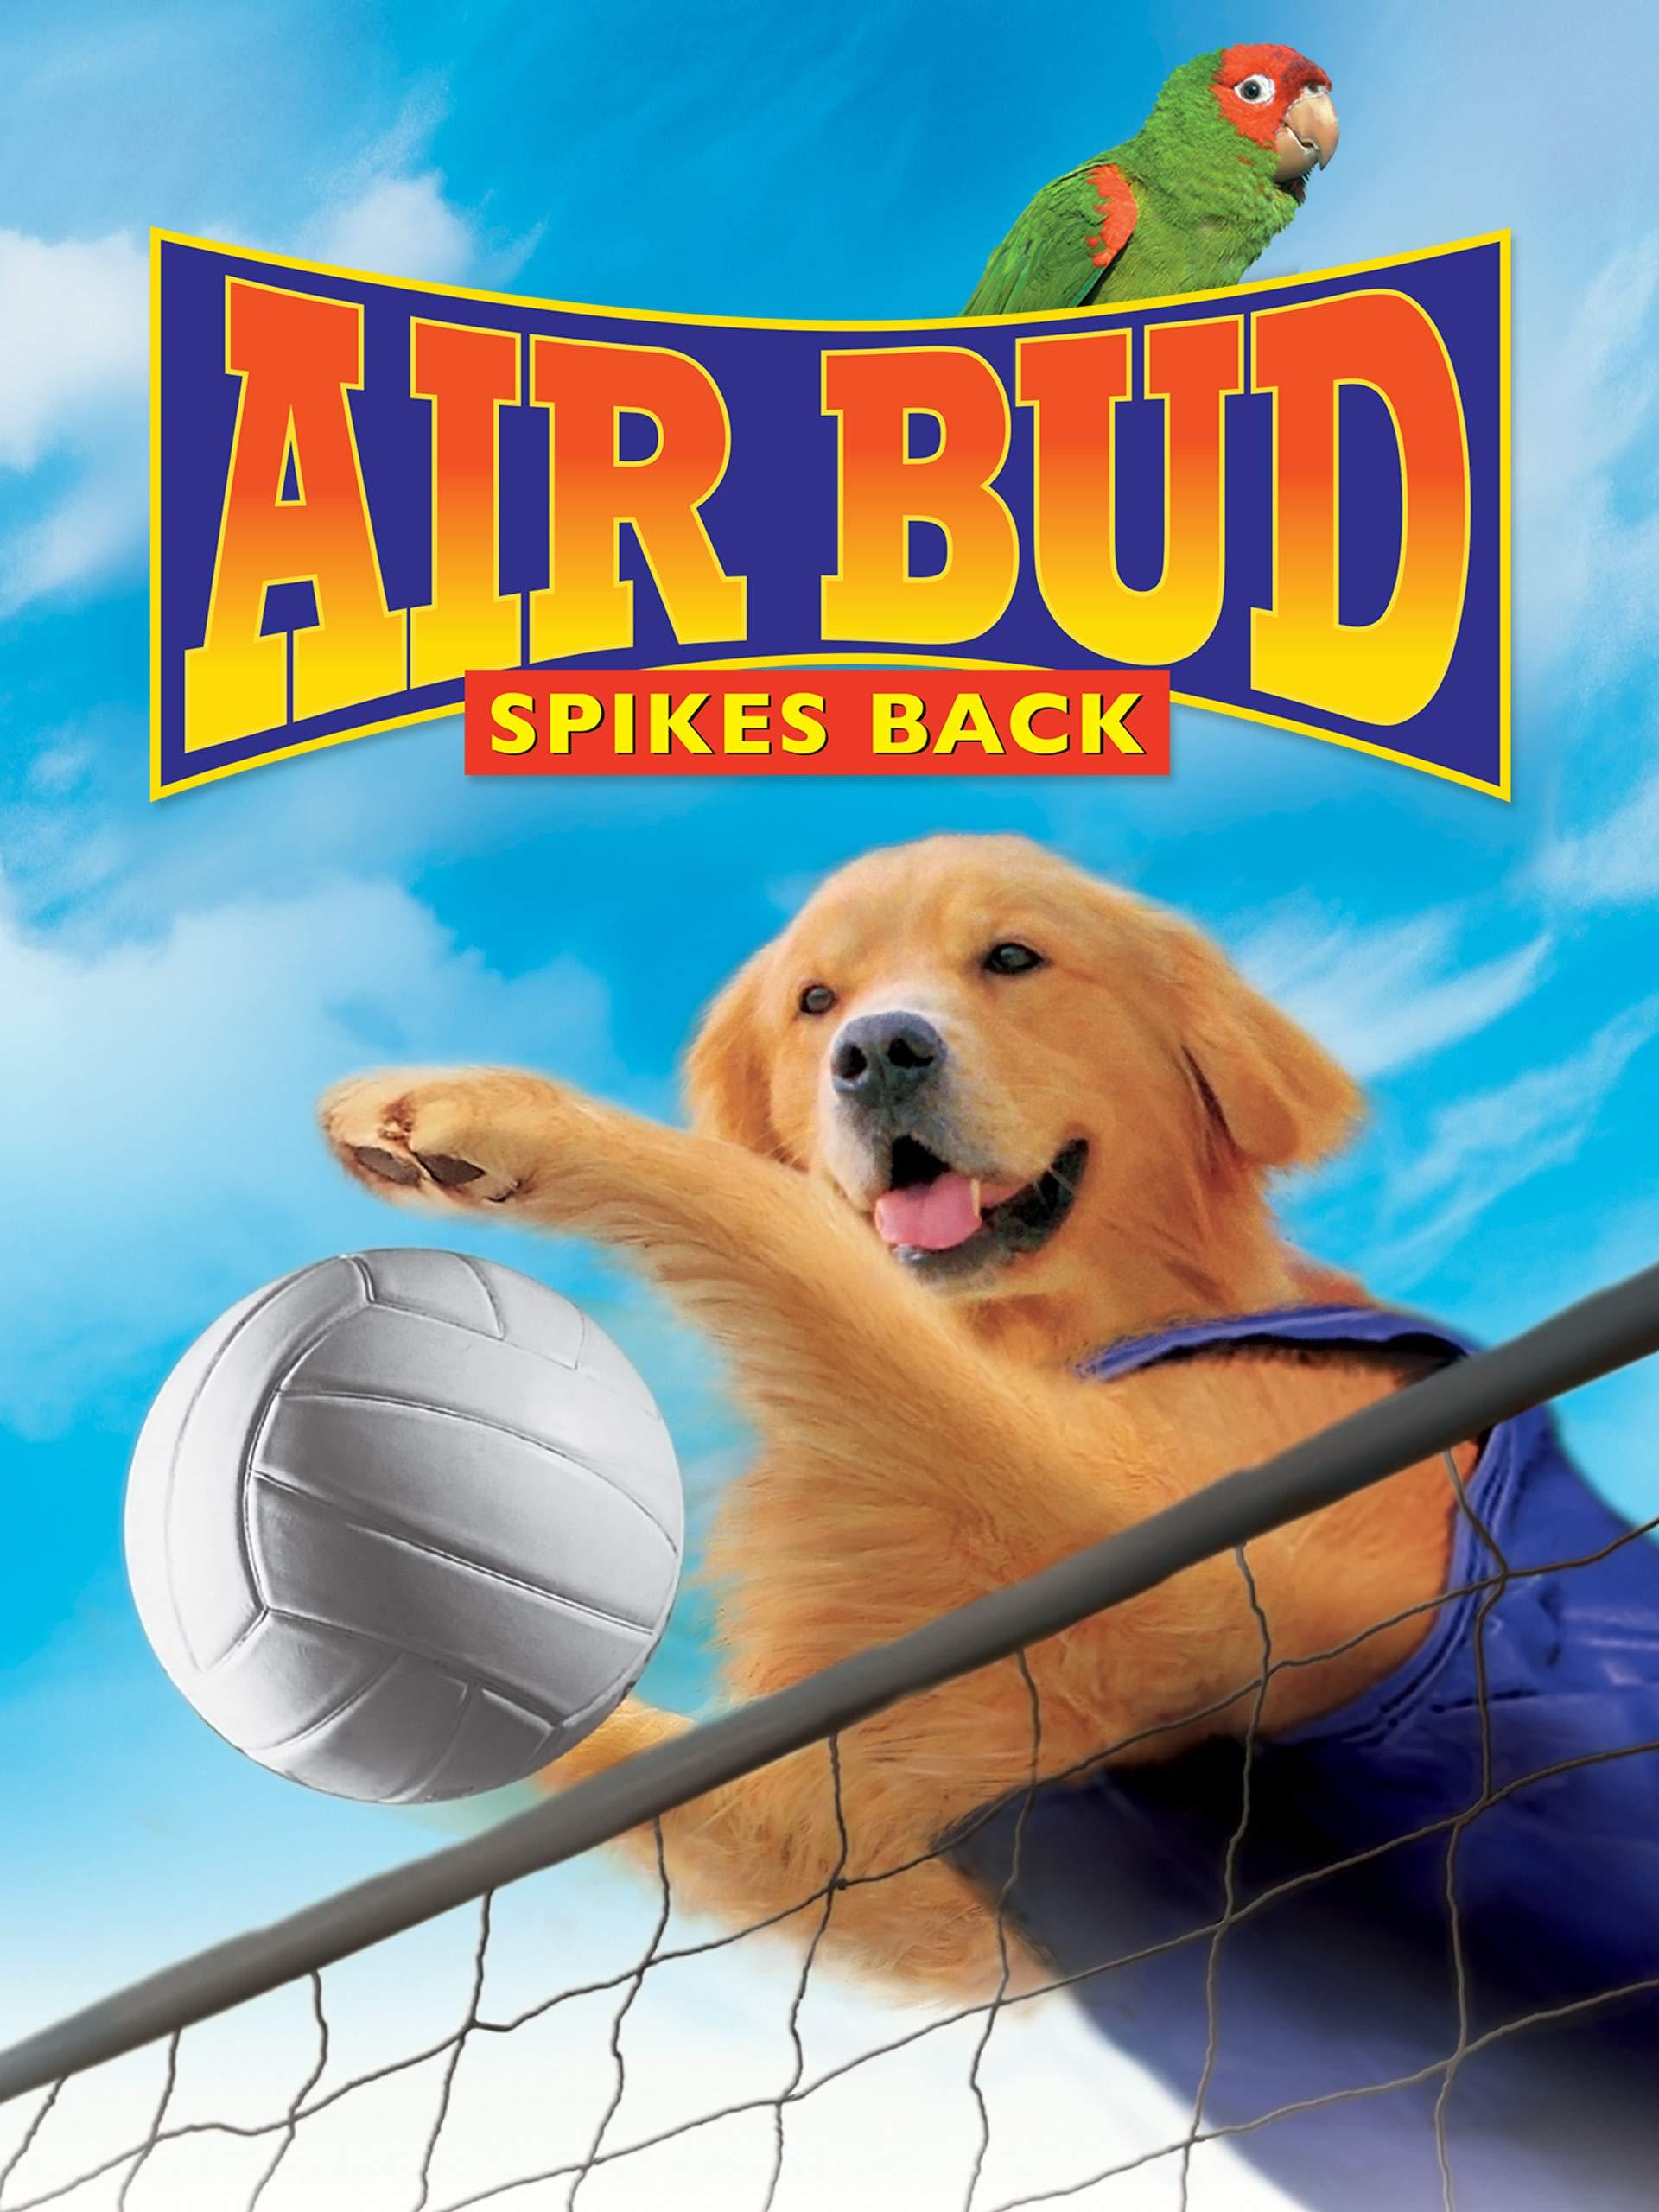 Air Bud Spikes Back